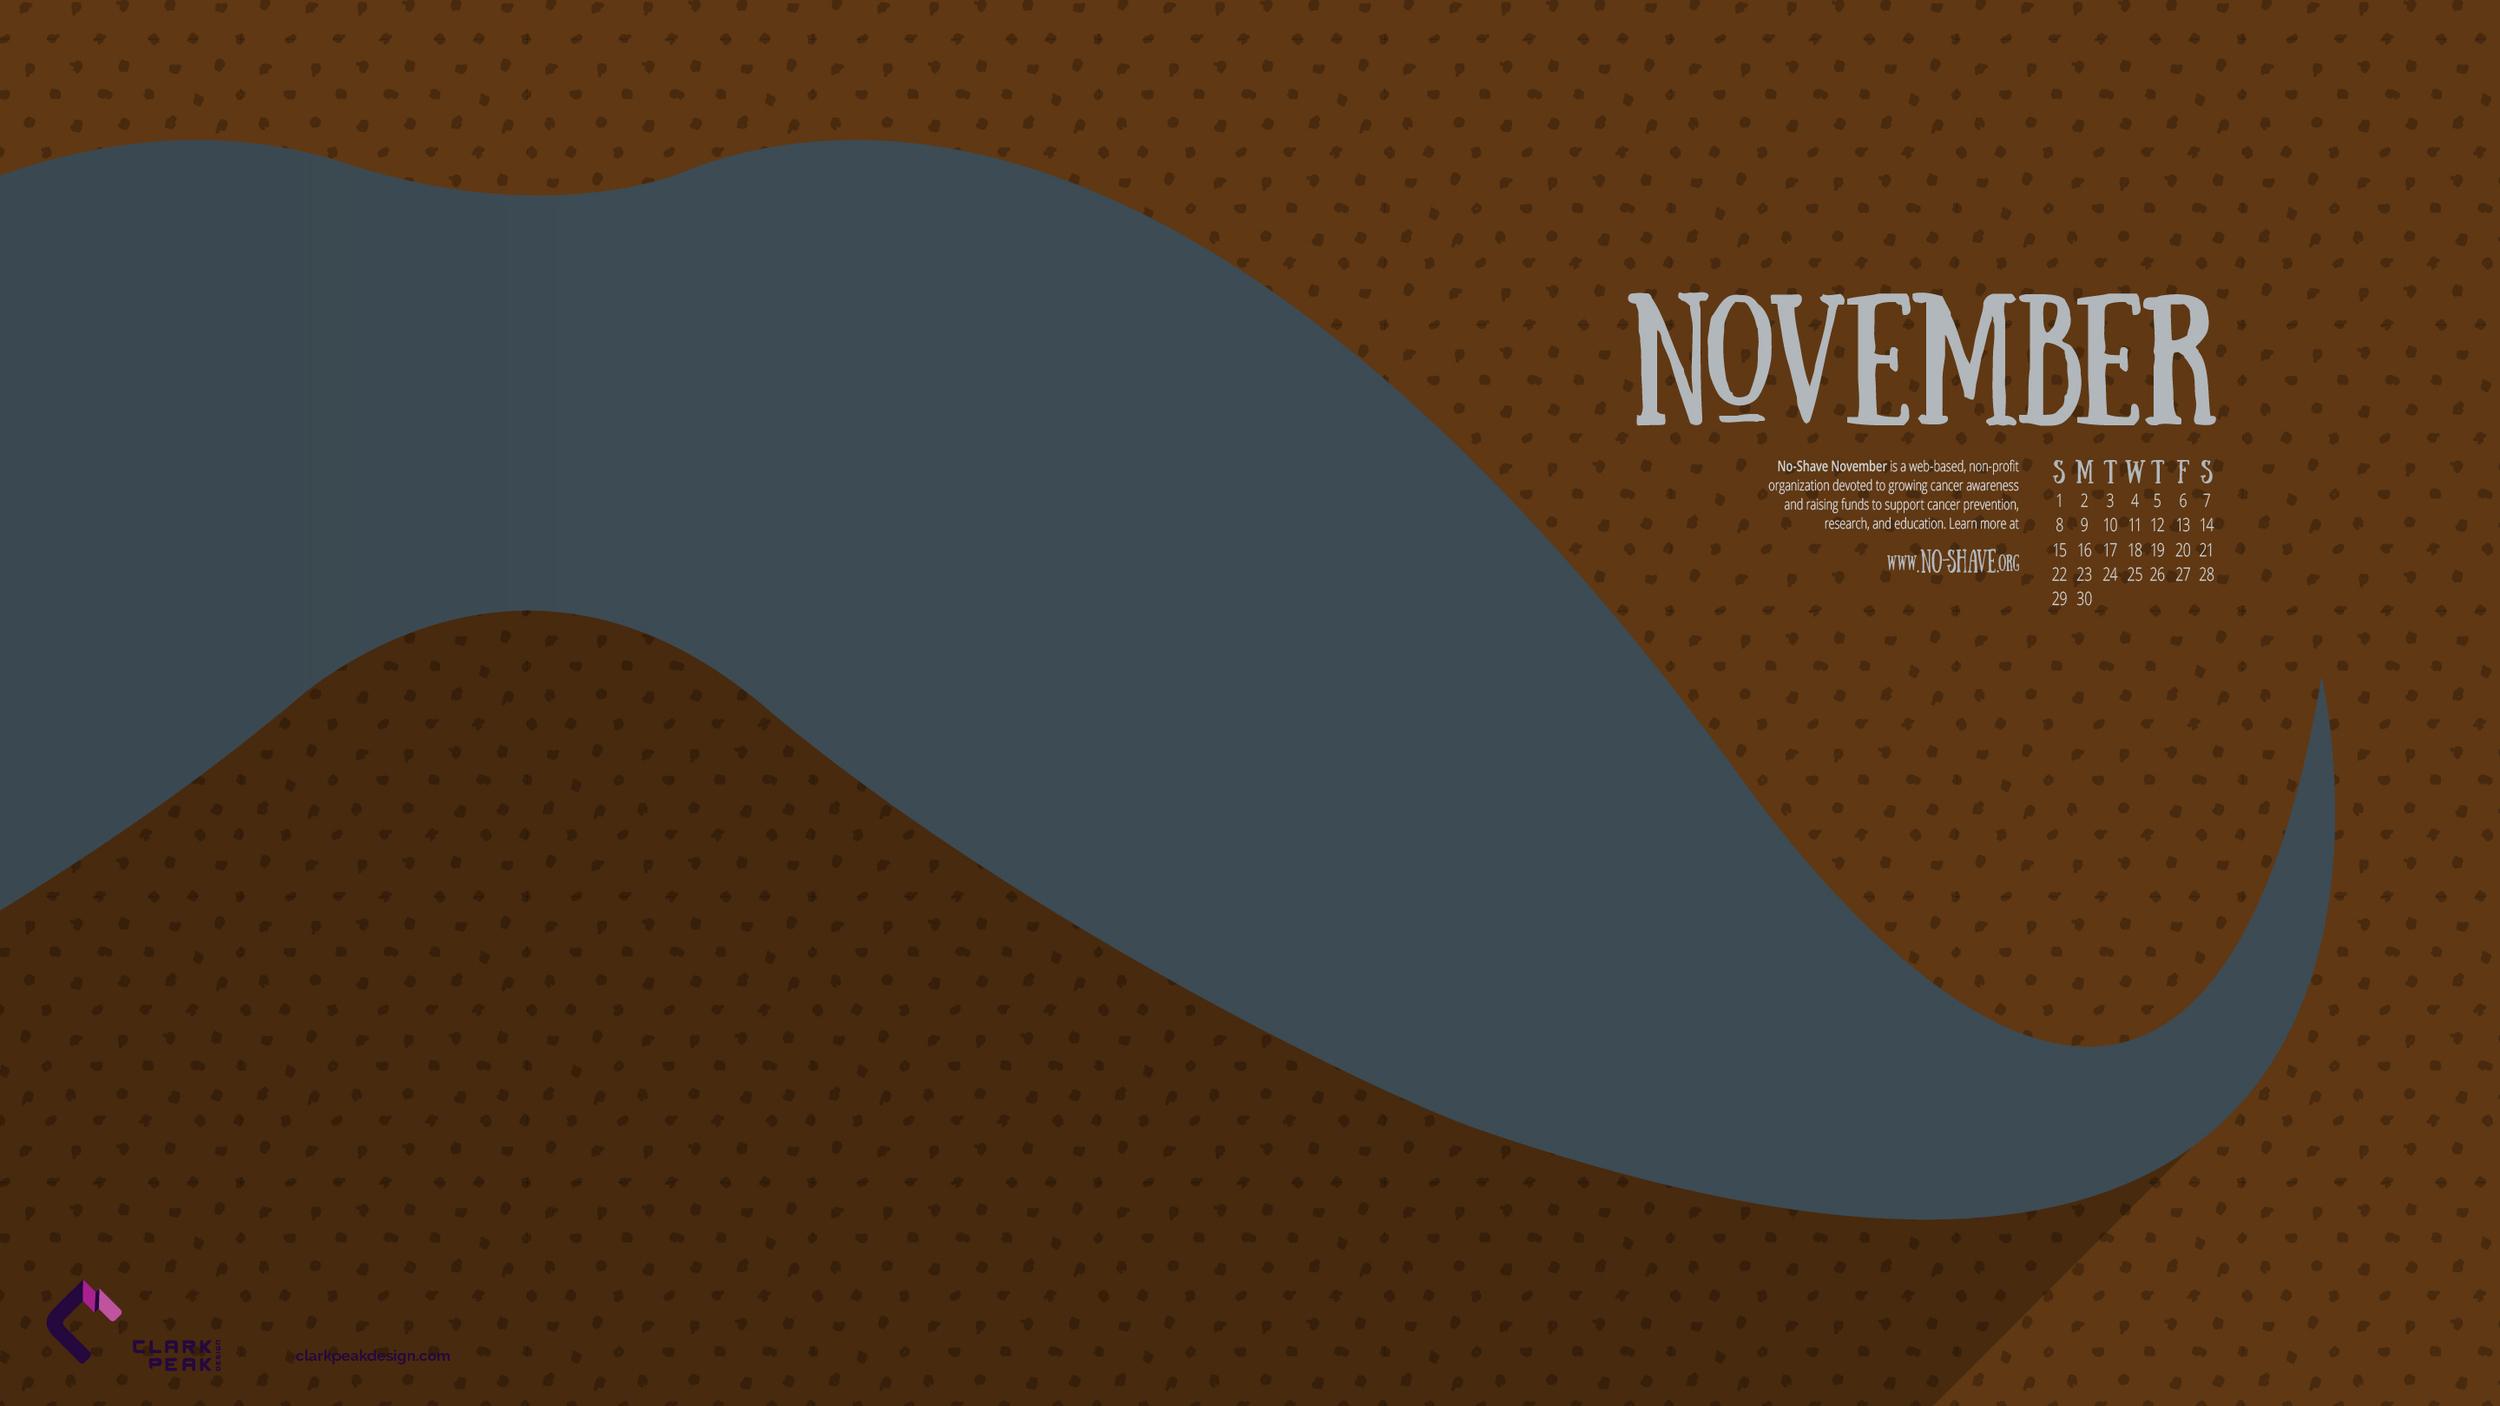 November 2015 Calendar Wallpaper by Clark Peak Design